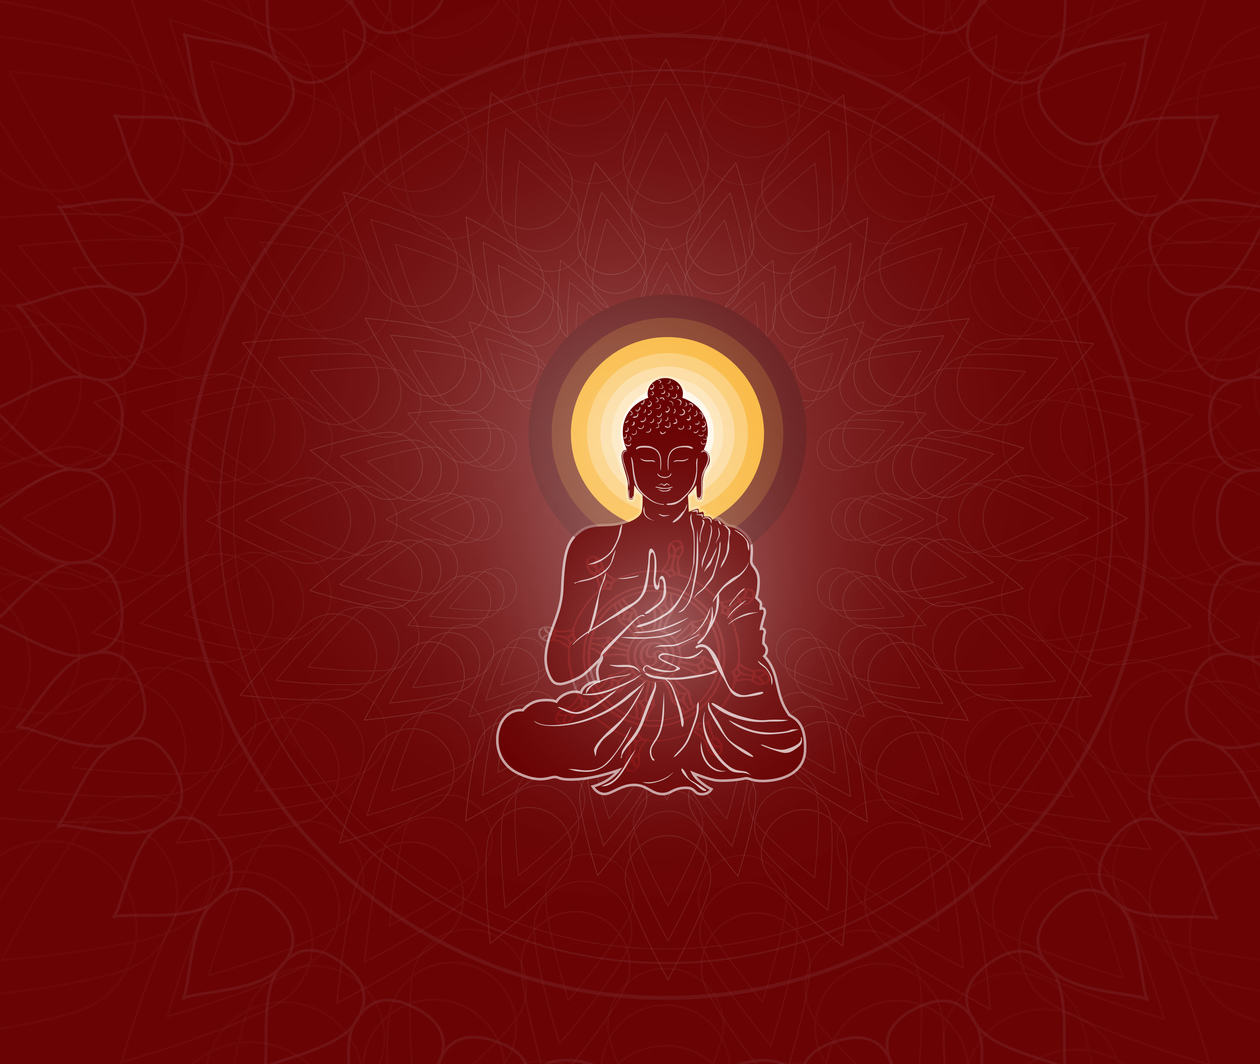 Buddhism: Diamond Sutra and Zen Meditation